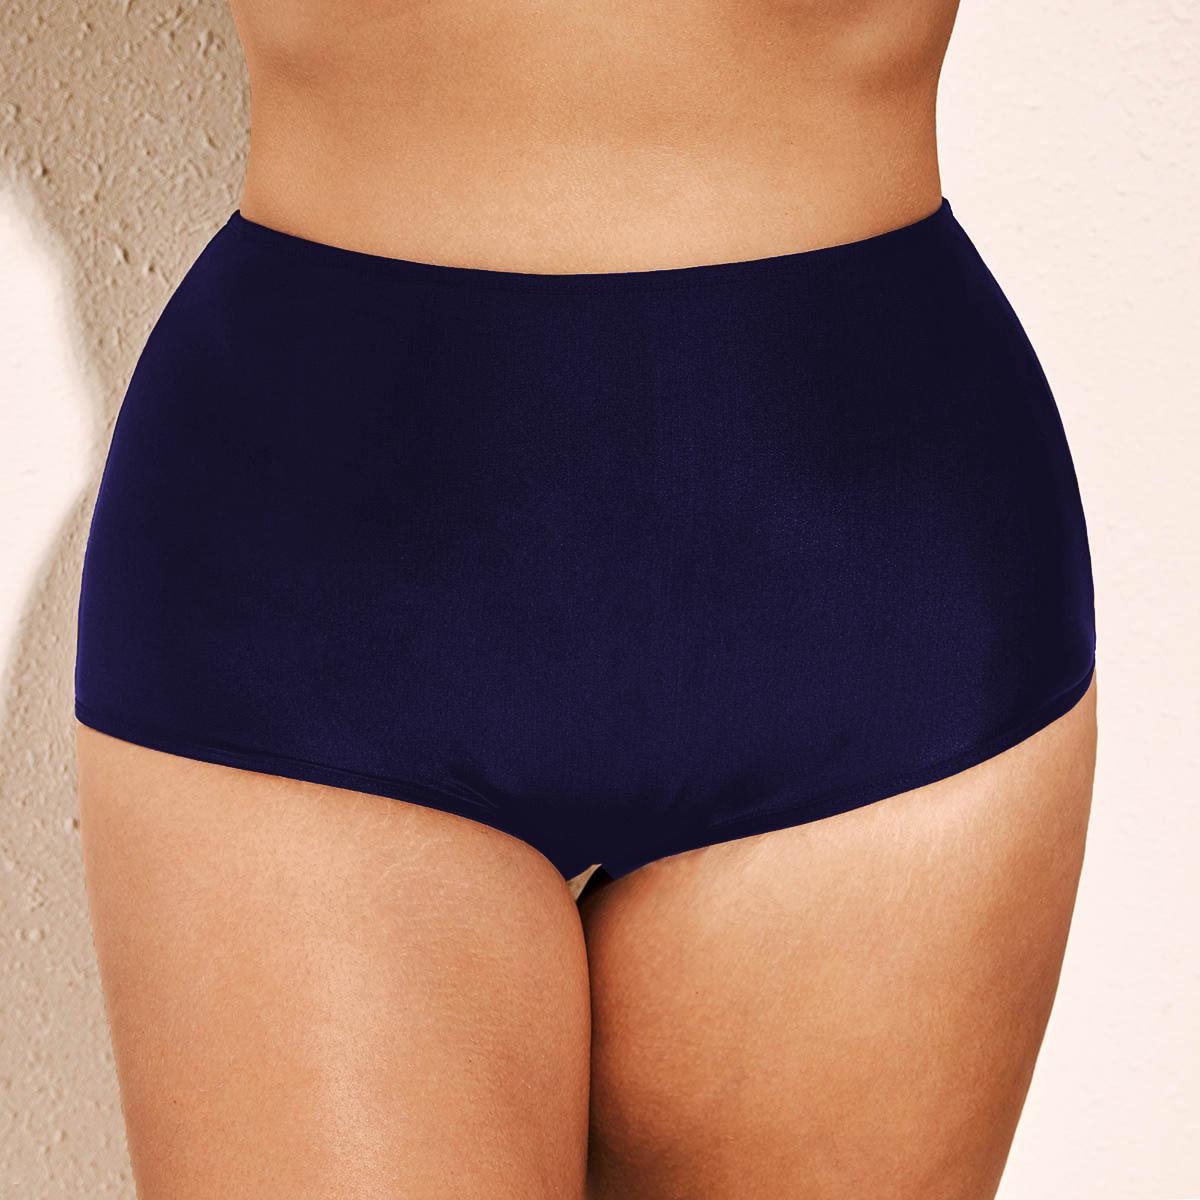 High Waist Navy Blue Plus Size Swimwear Panty